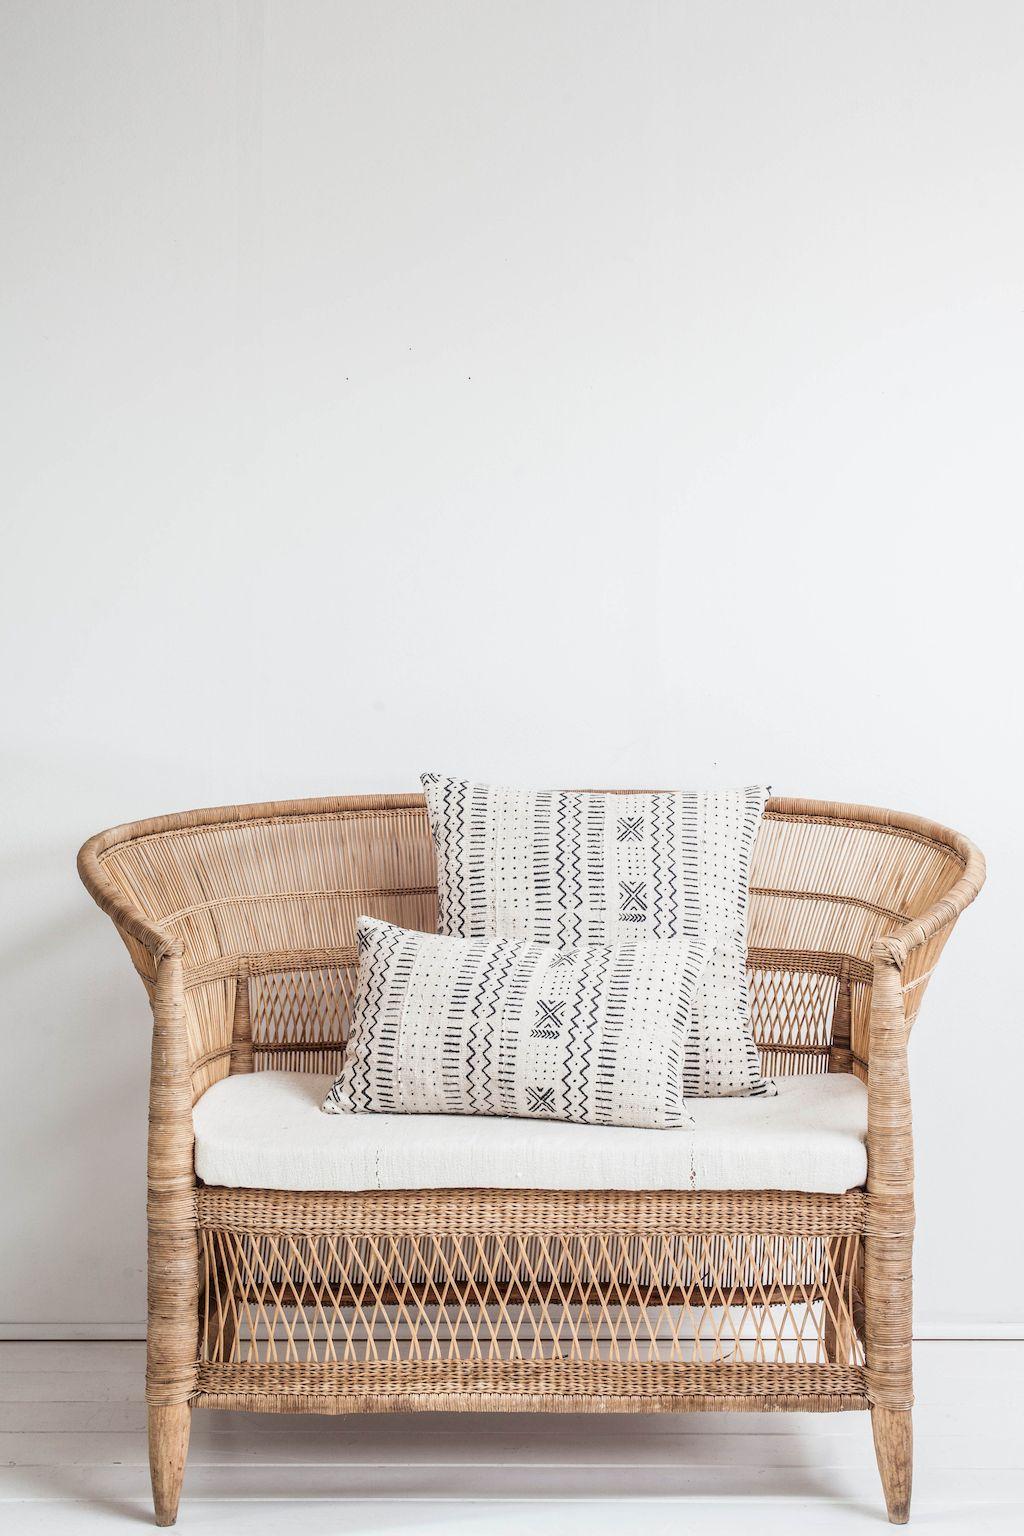 Rattan Furniture183